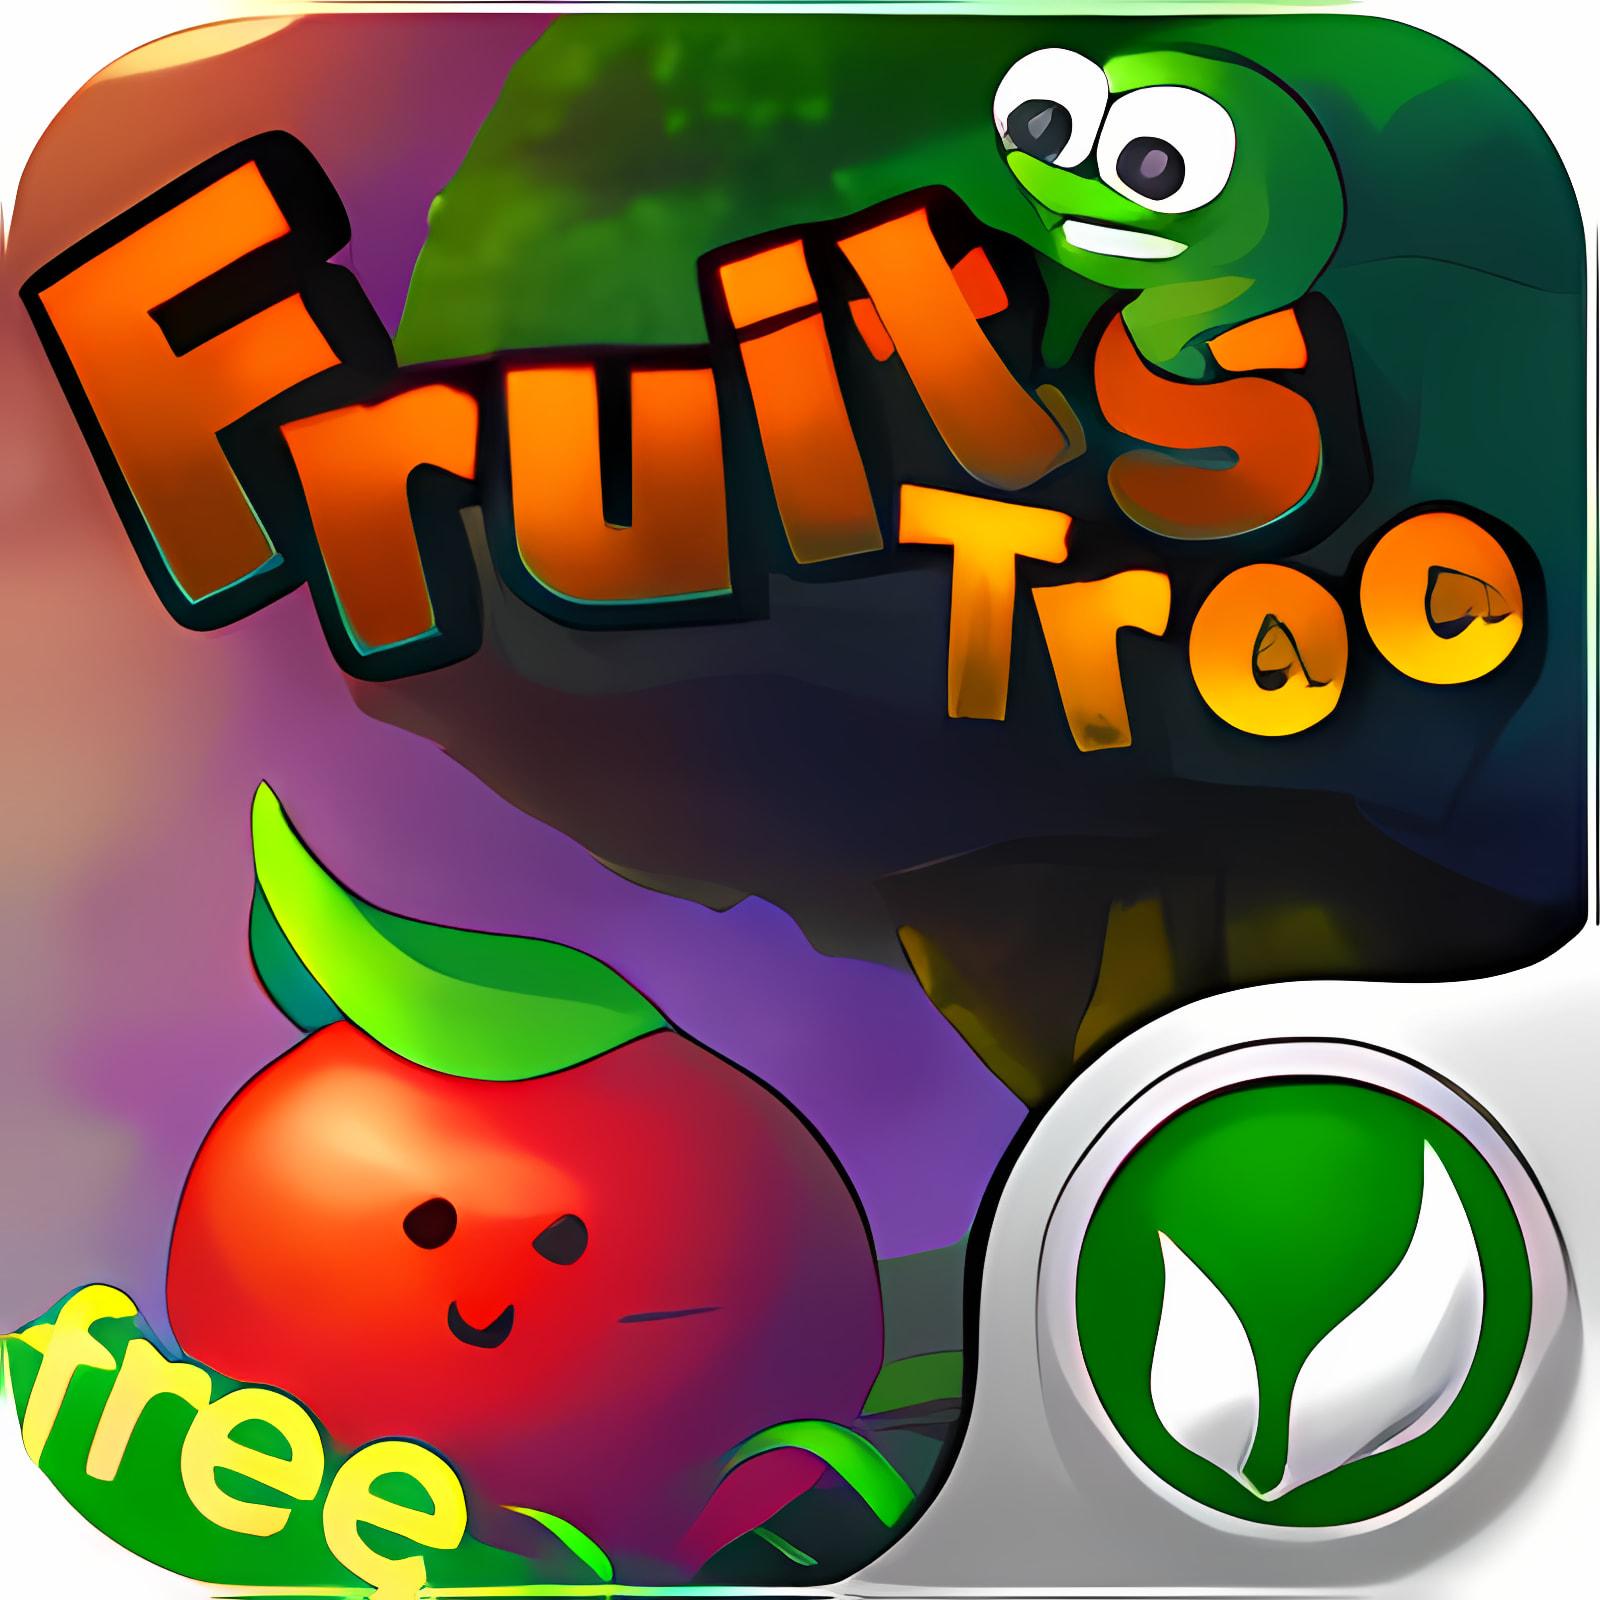 FruitsTree